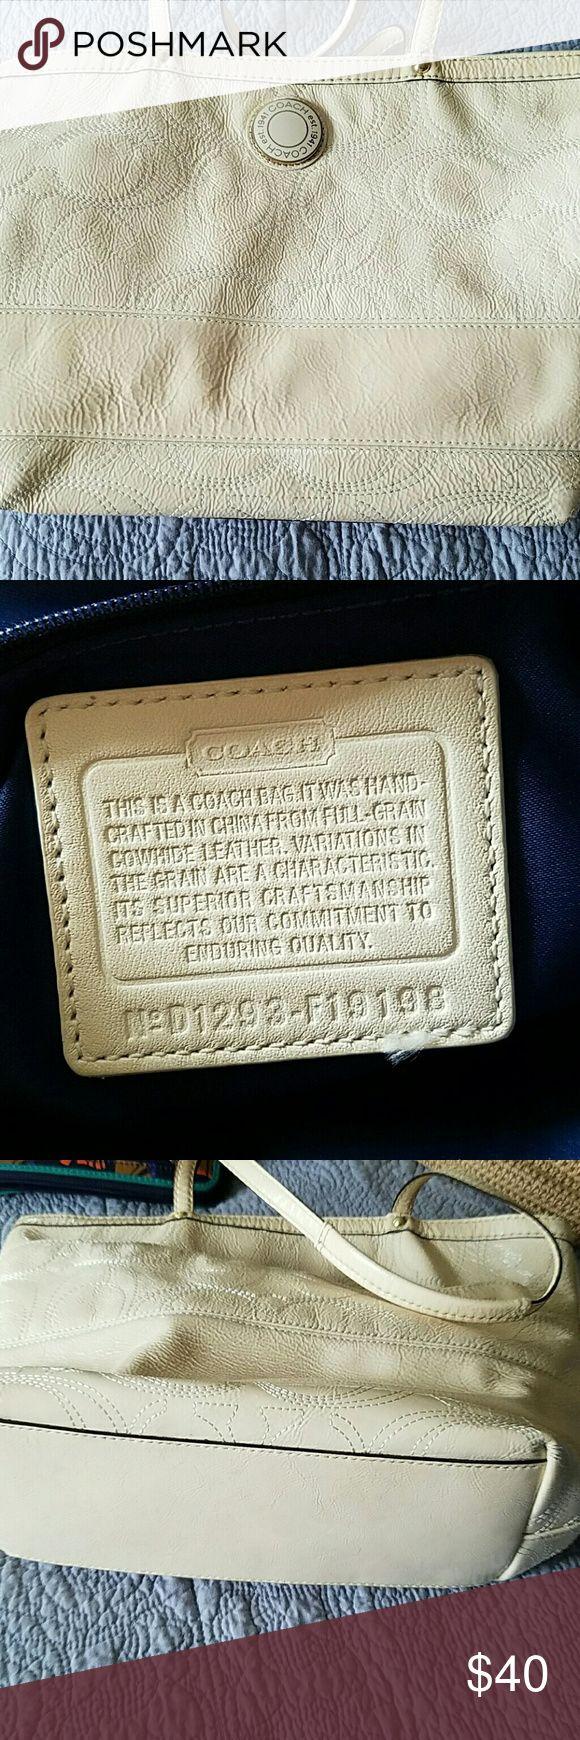 Coach purse Cream colored coach tote  purse Coach Bags Totes